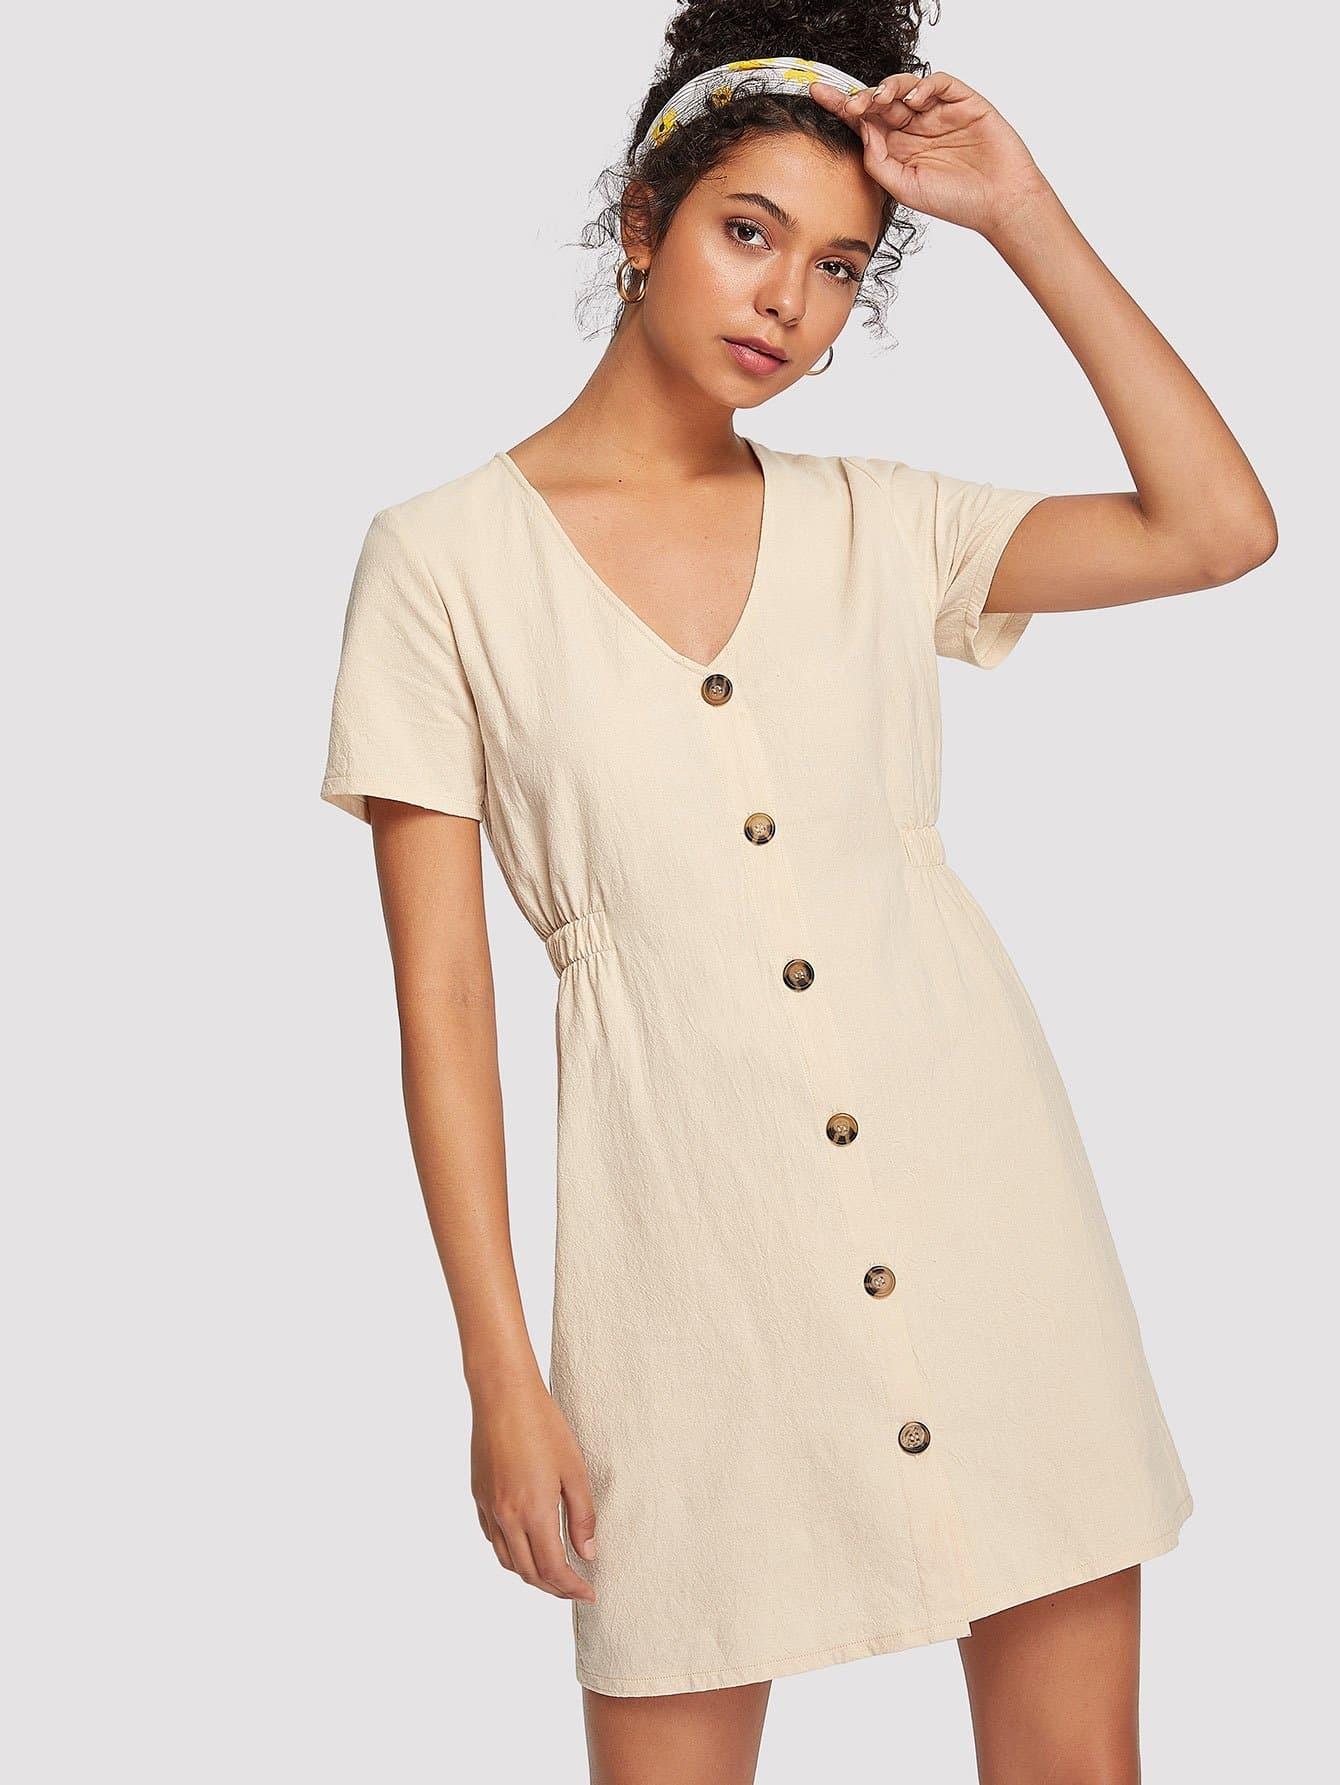 Single Breasted Front Dress все цены